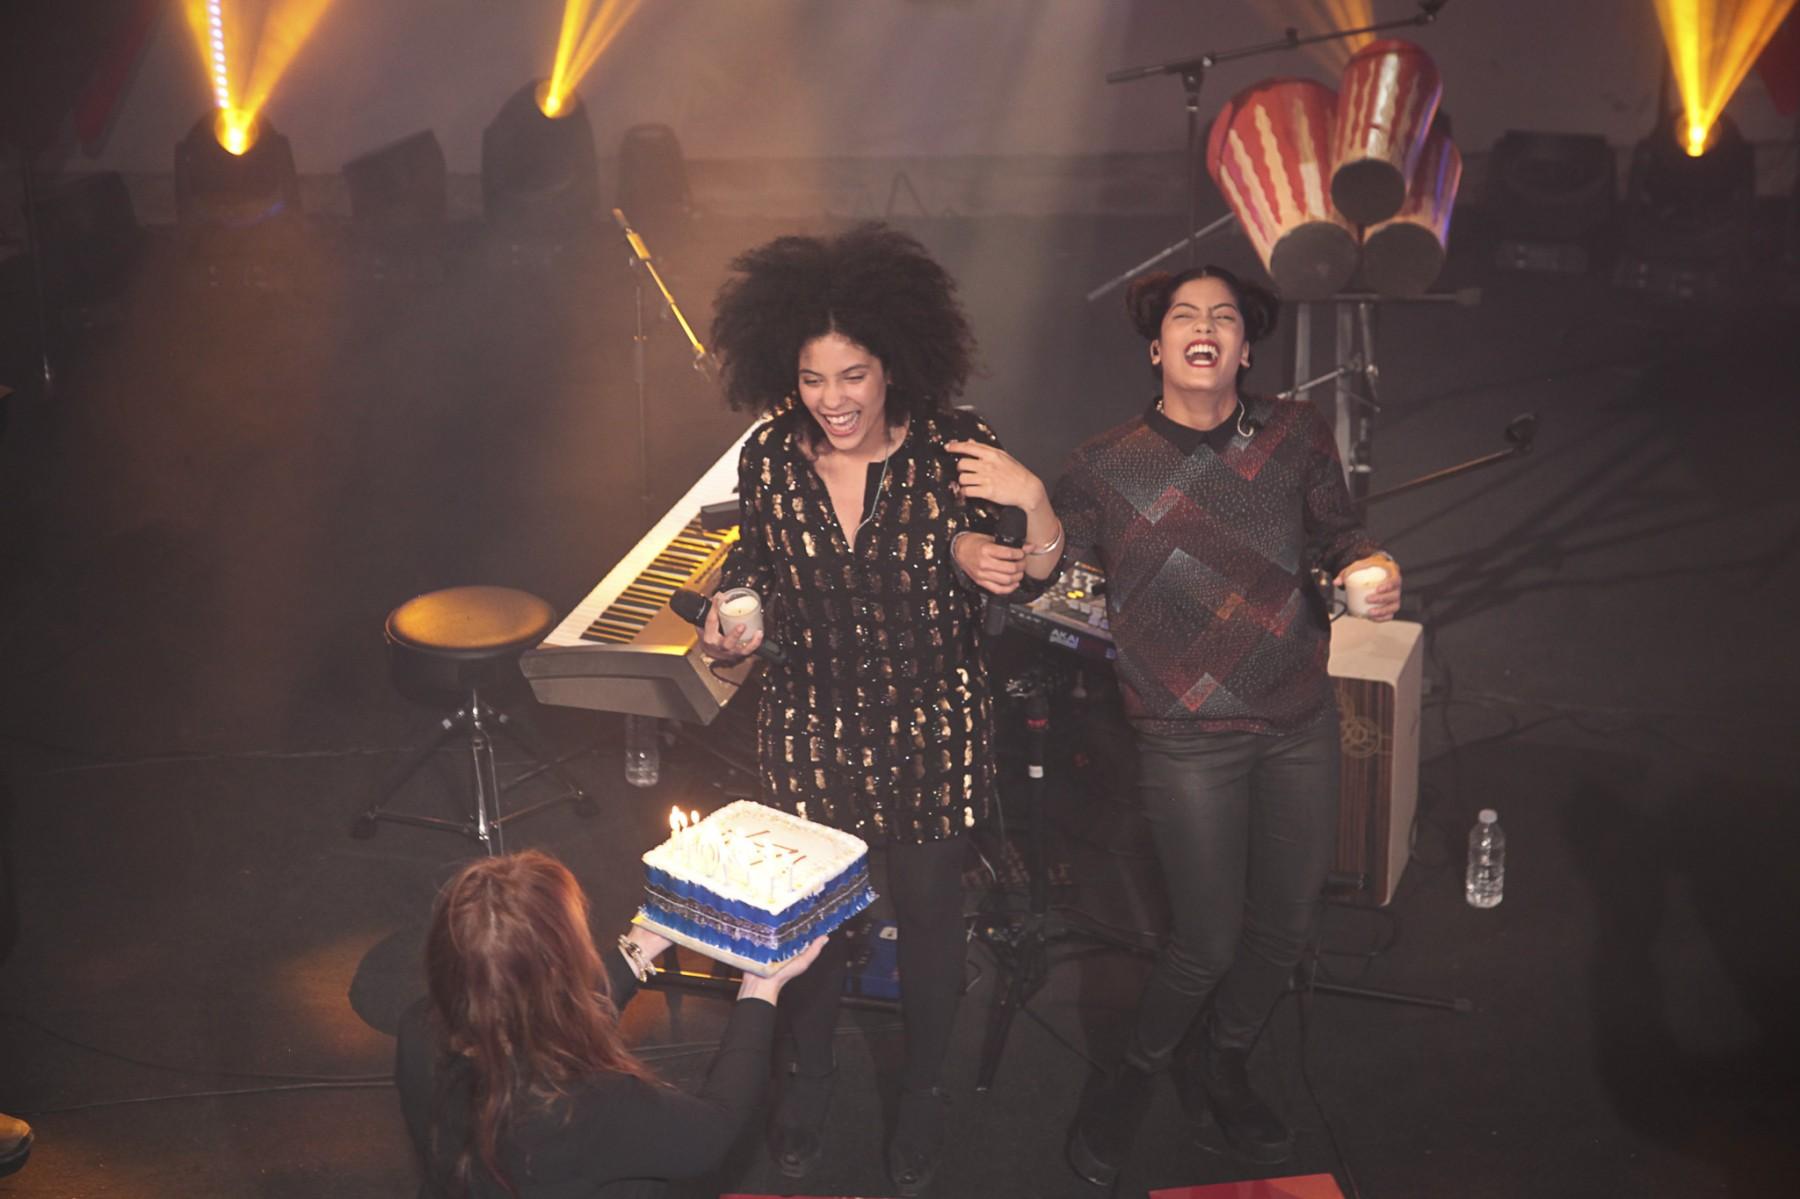 IBEYI AND THEIR BIRTHDAY CAKE